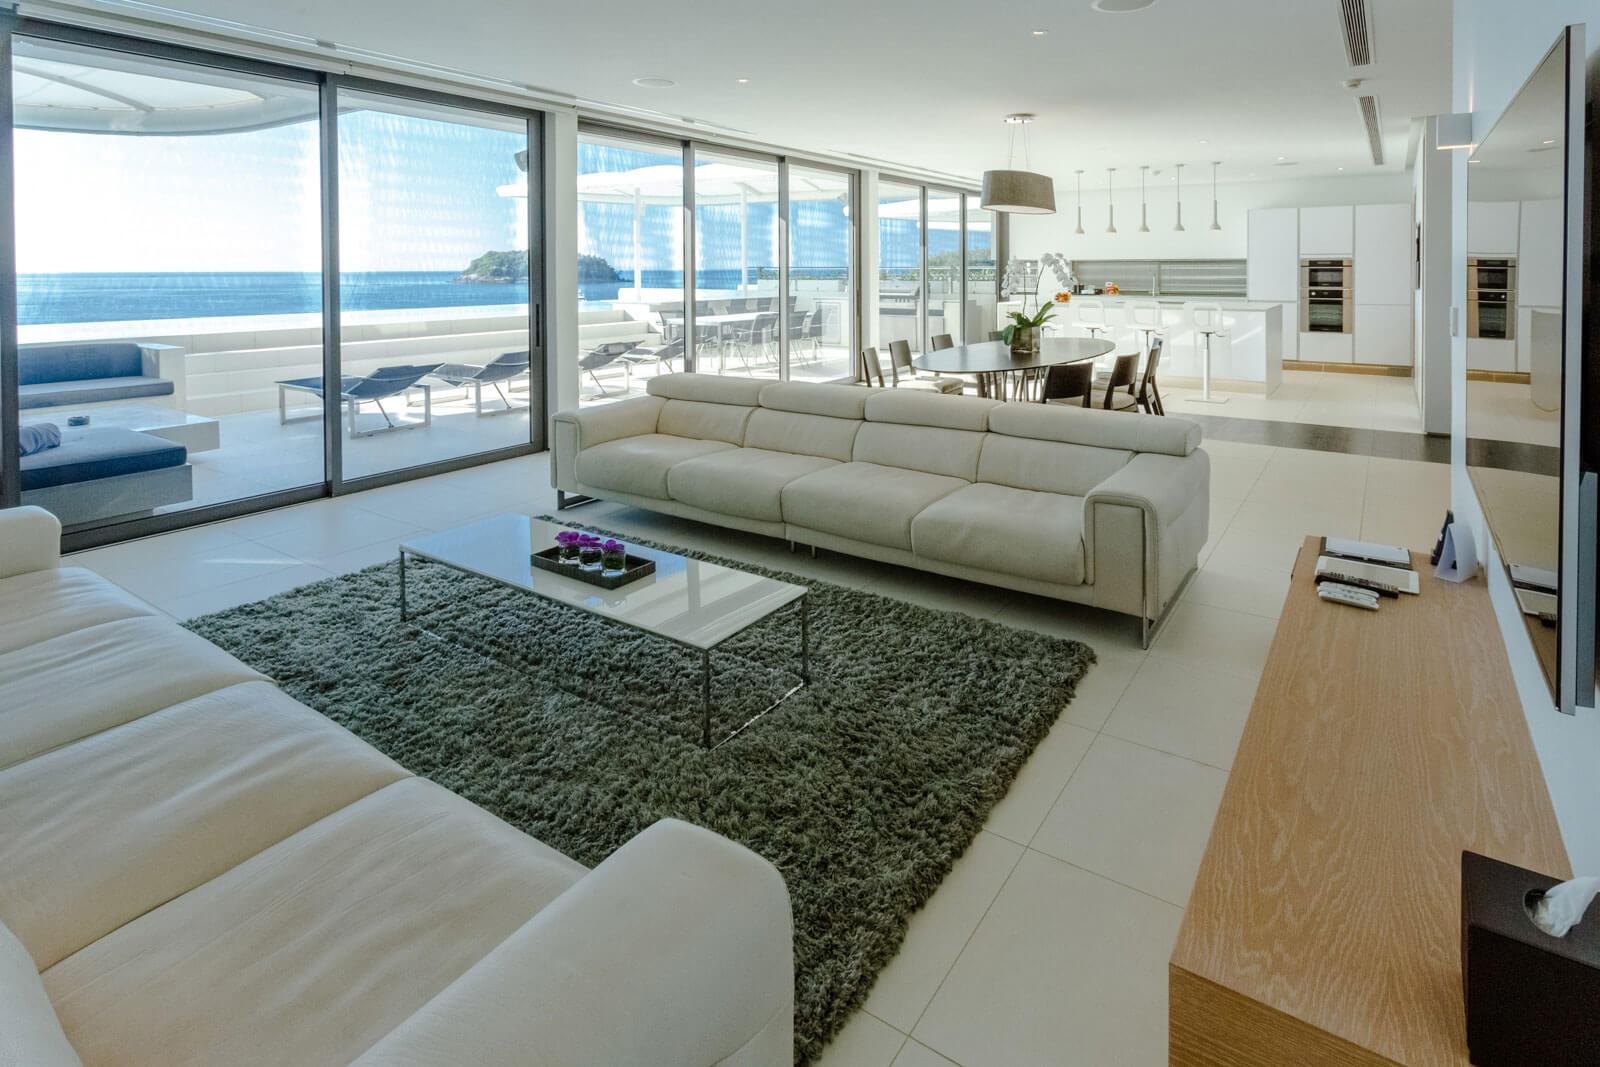 Luxury Property Ownership - Purchasing